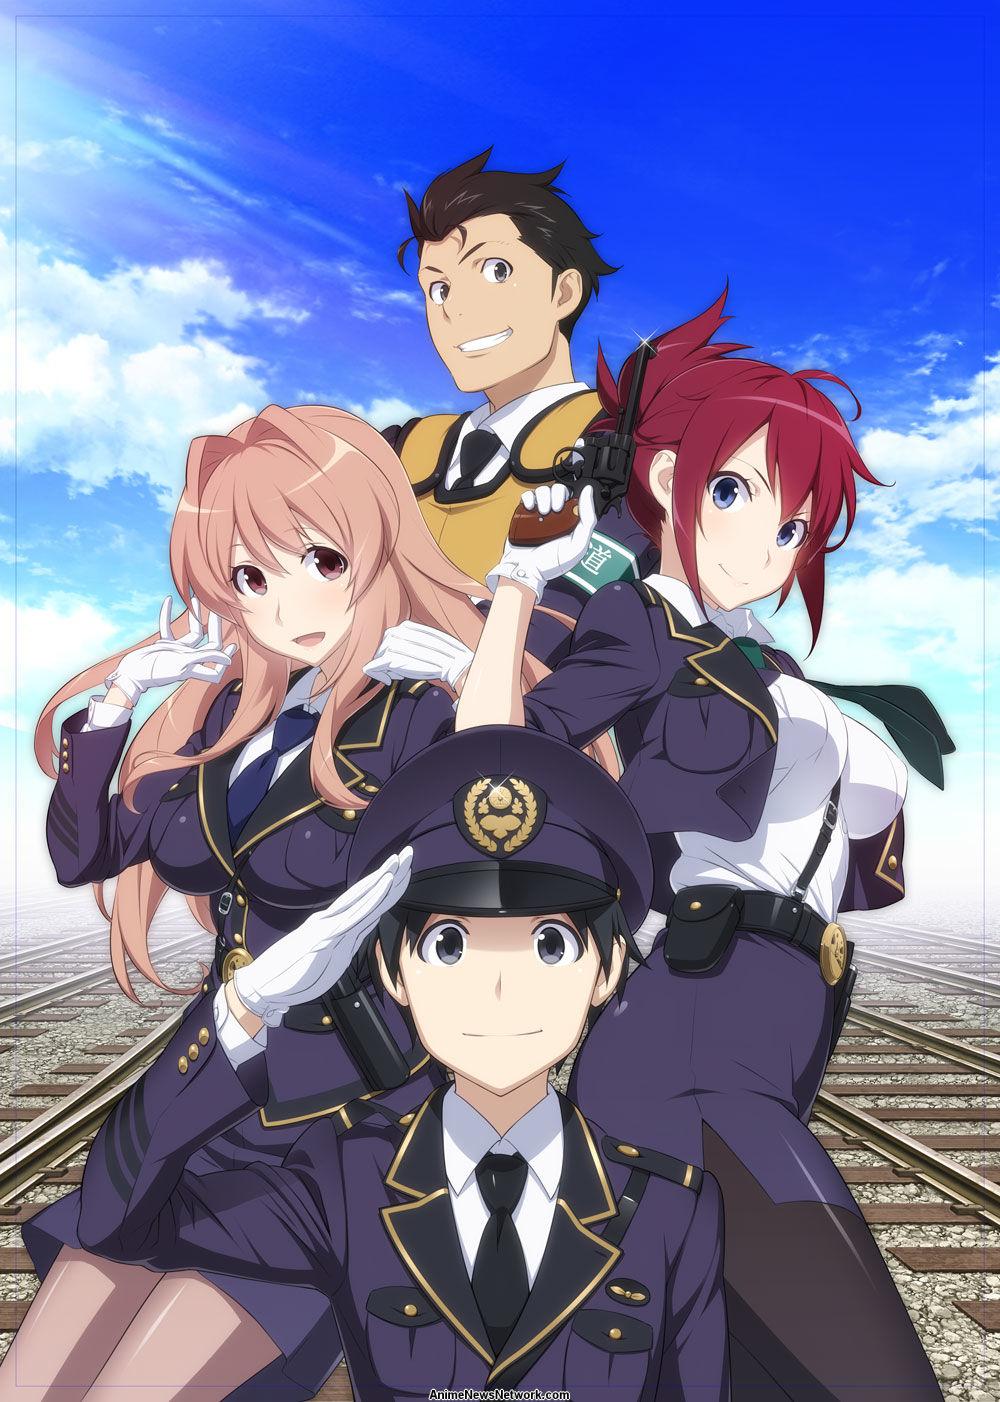 Anime Spotlight - Outbreak Company - Anime News Network